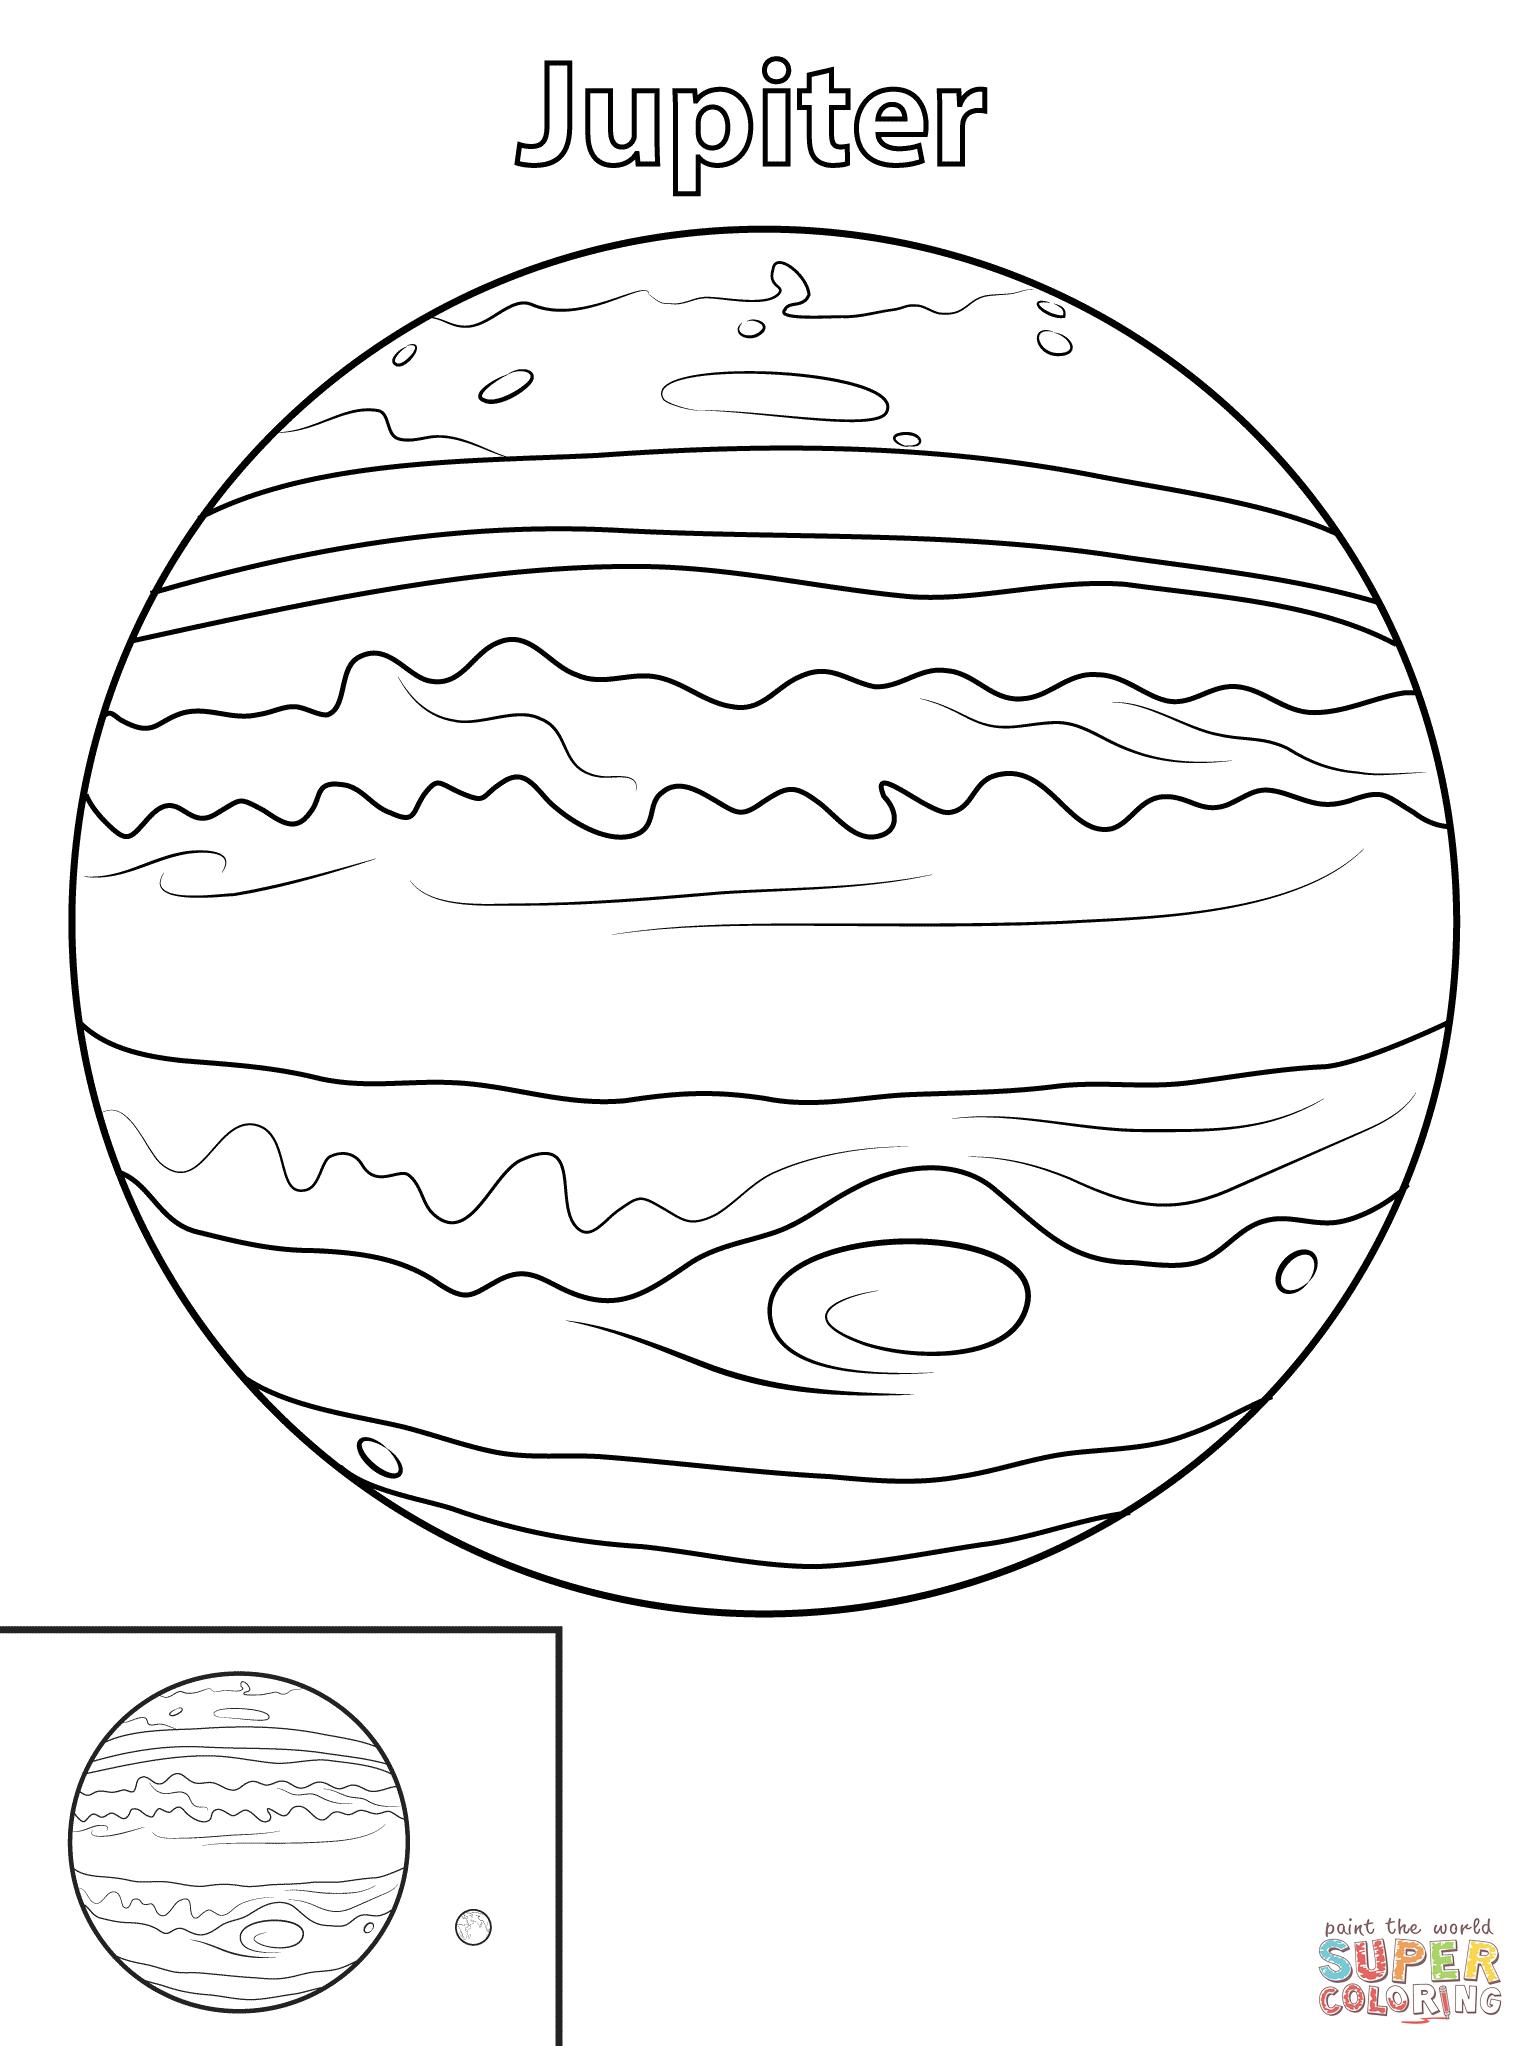 Dibujo De Planeta Jupiter Para Colorear